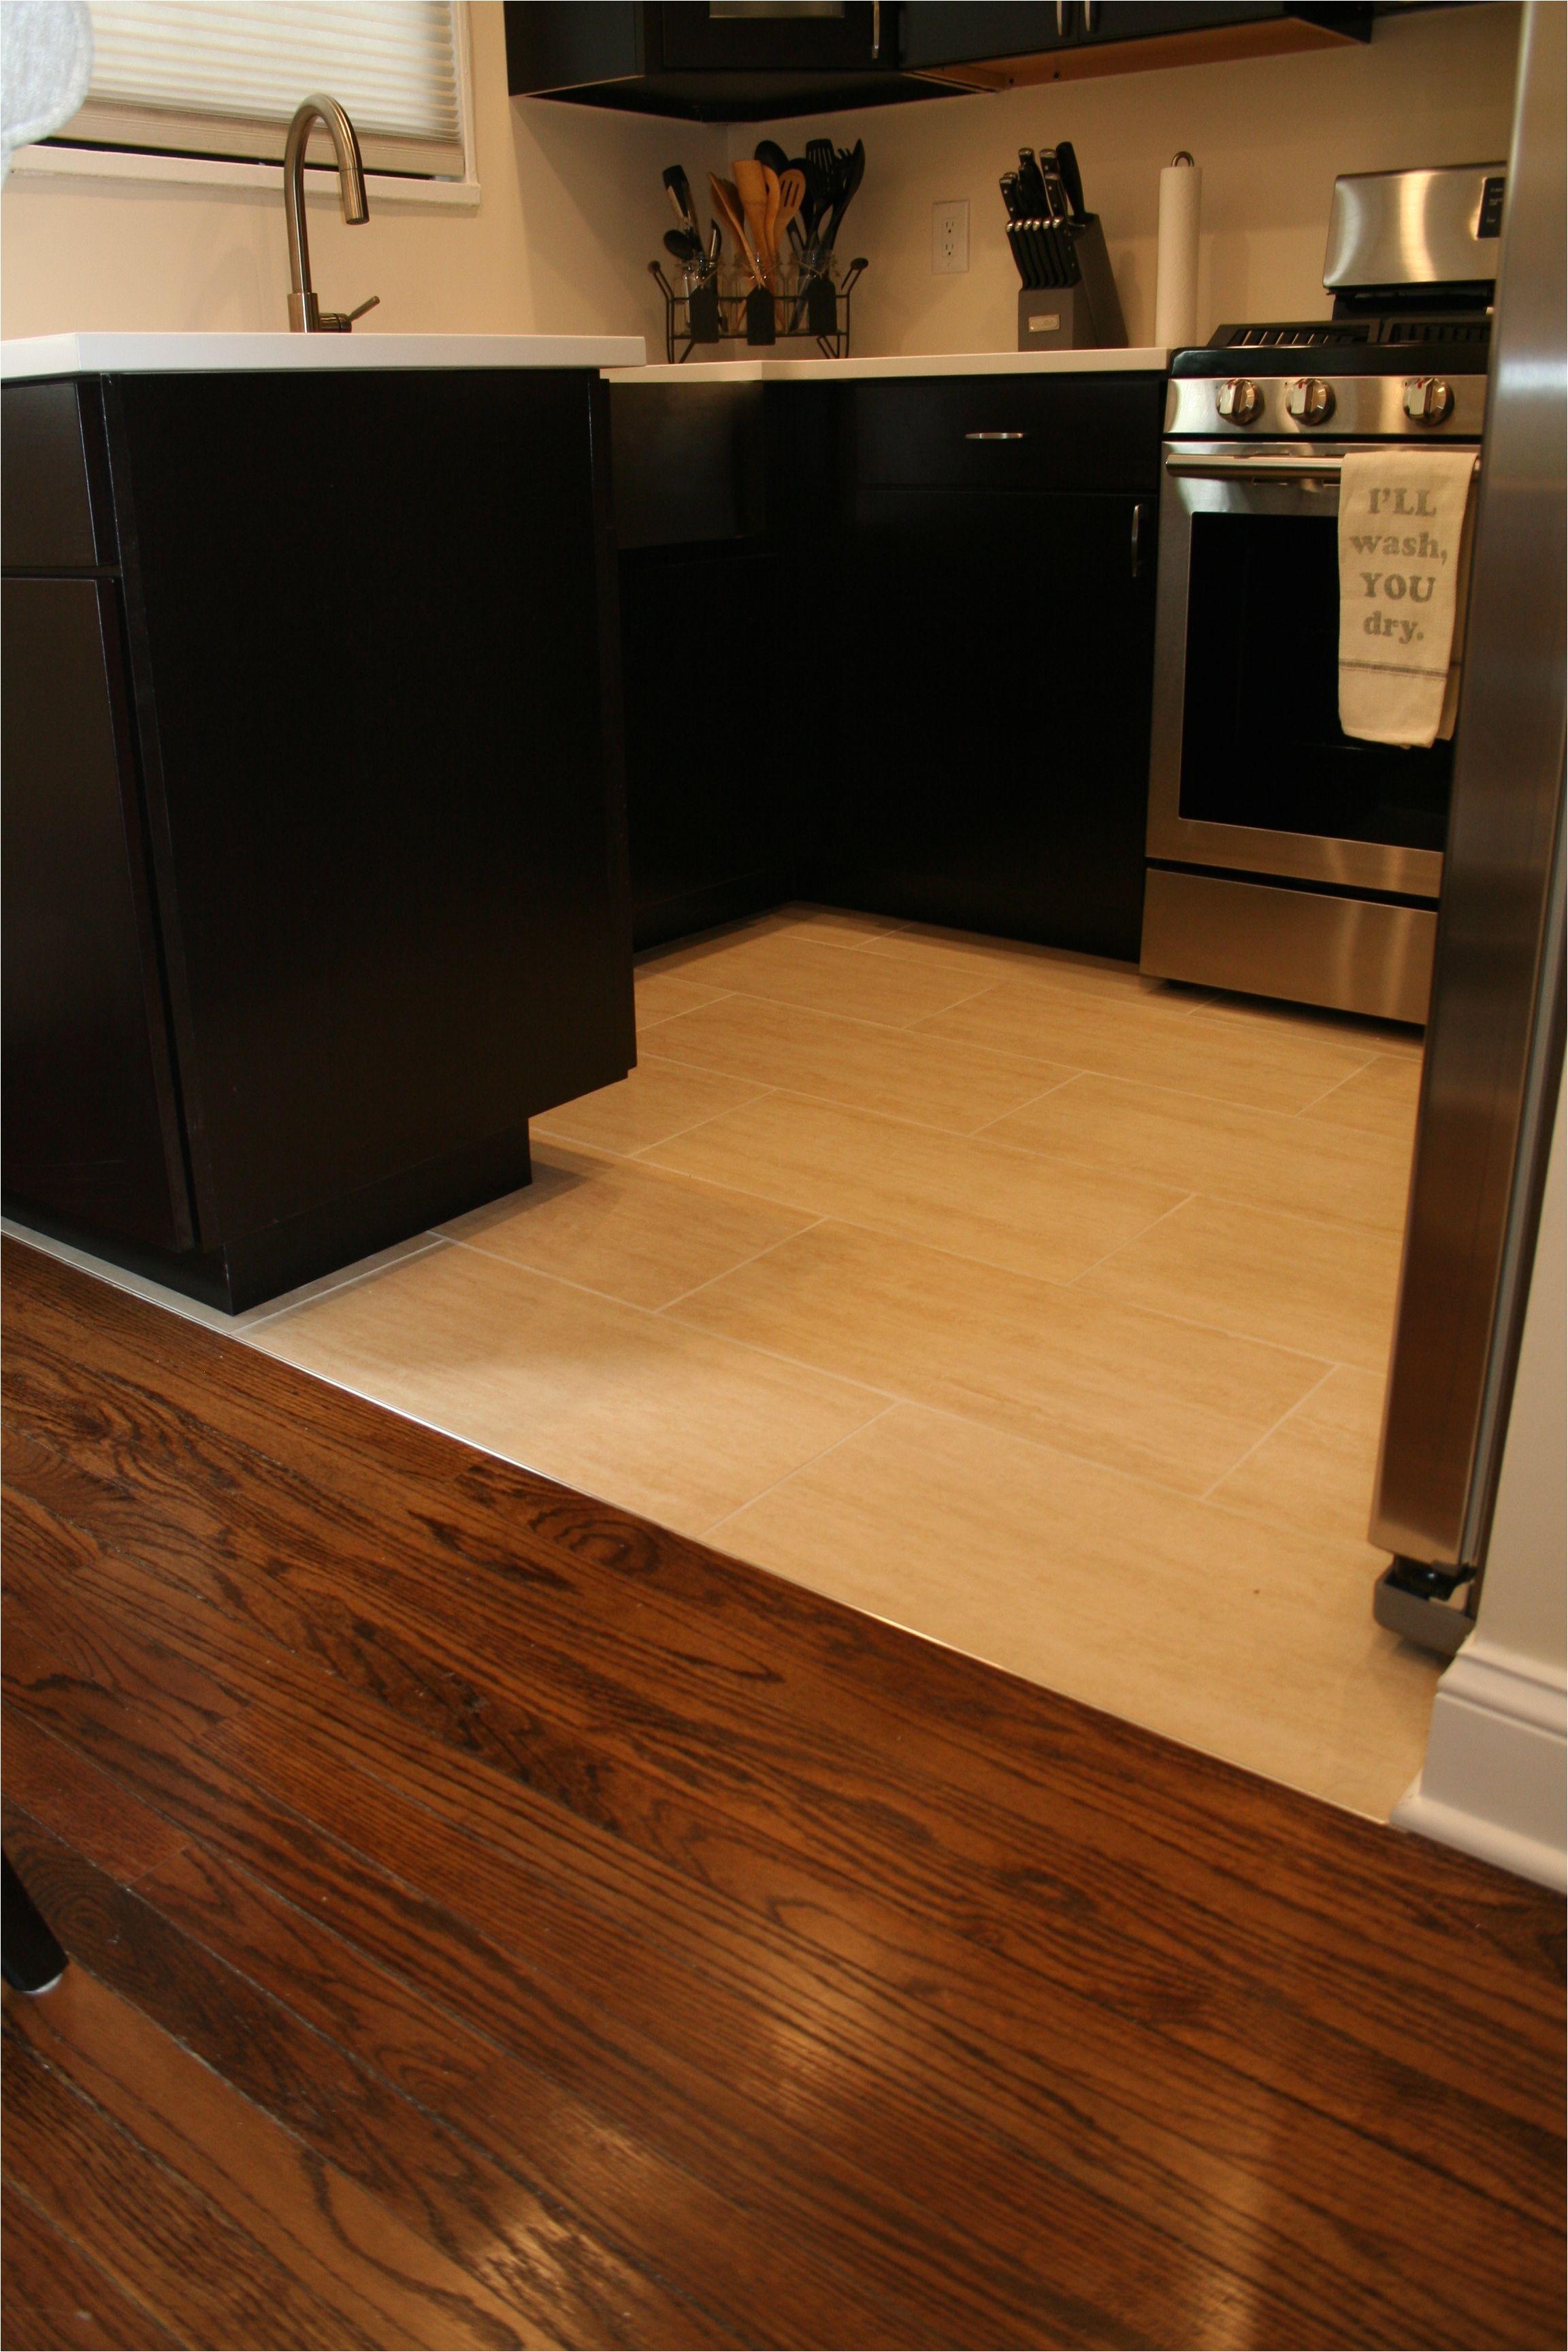 Most Durable Hardwood Floors Transition From Tile to Wood Floors Light to Dark Flooring Http